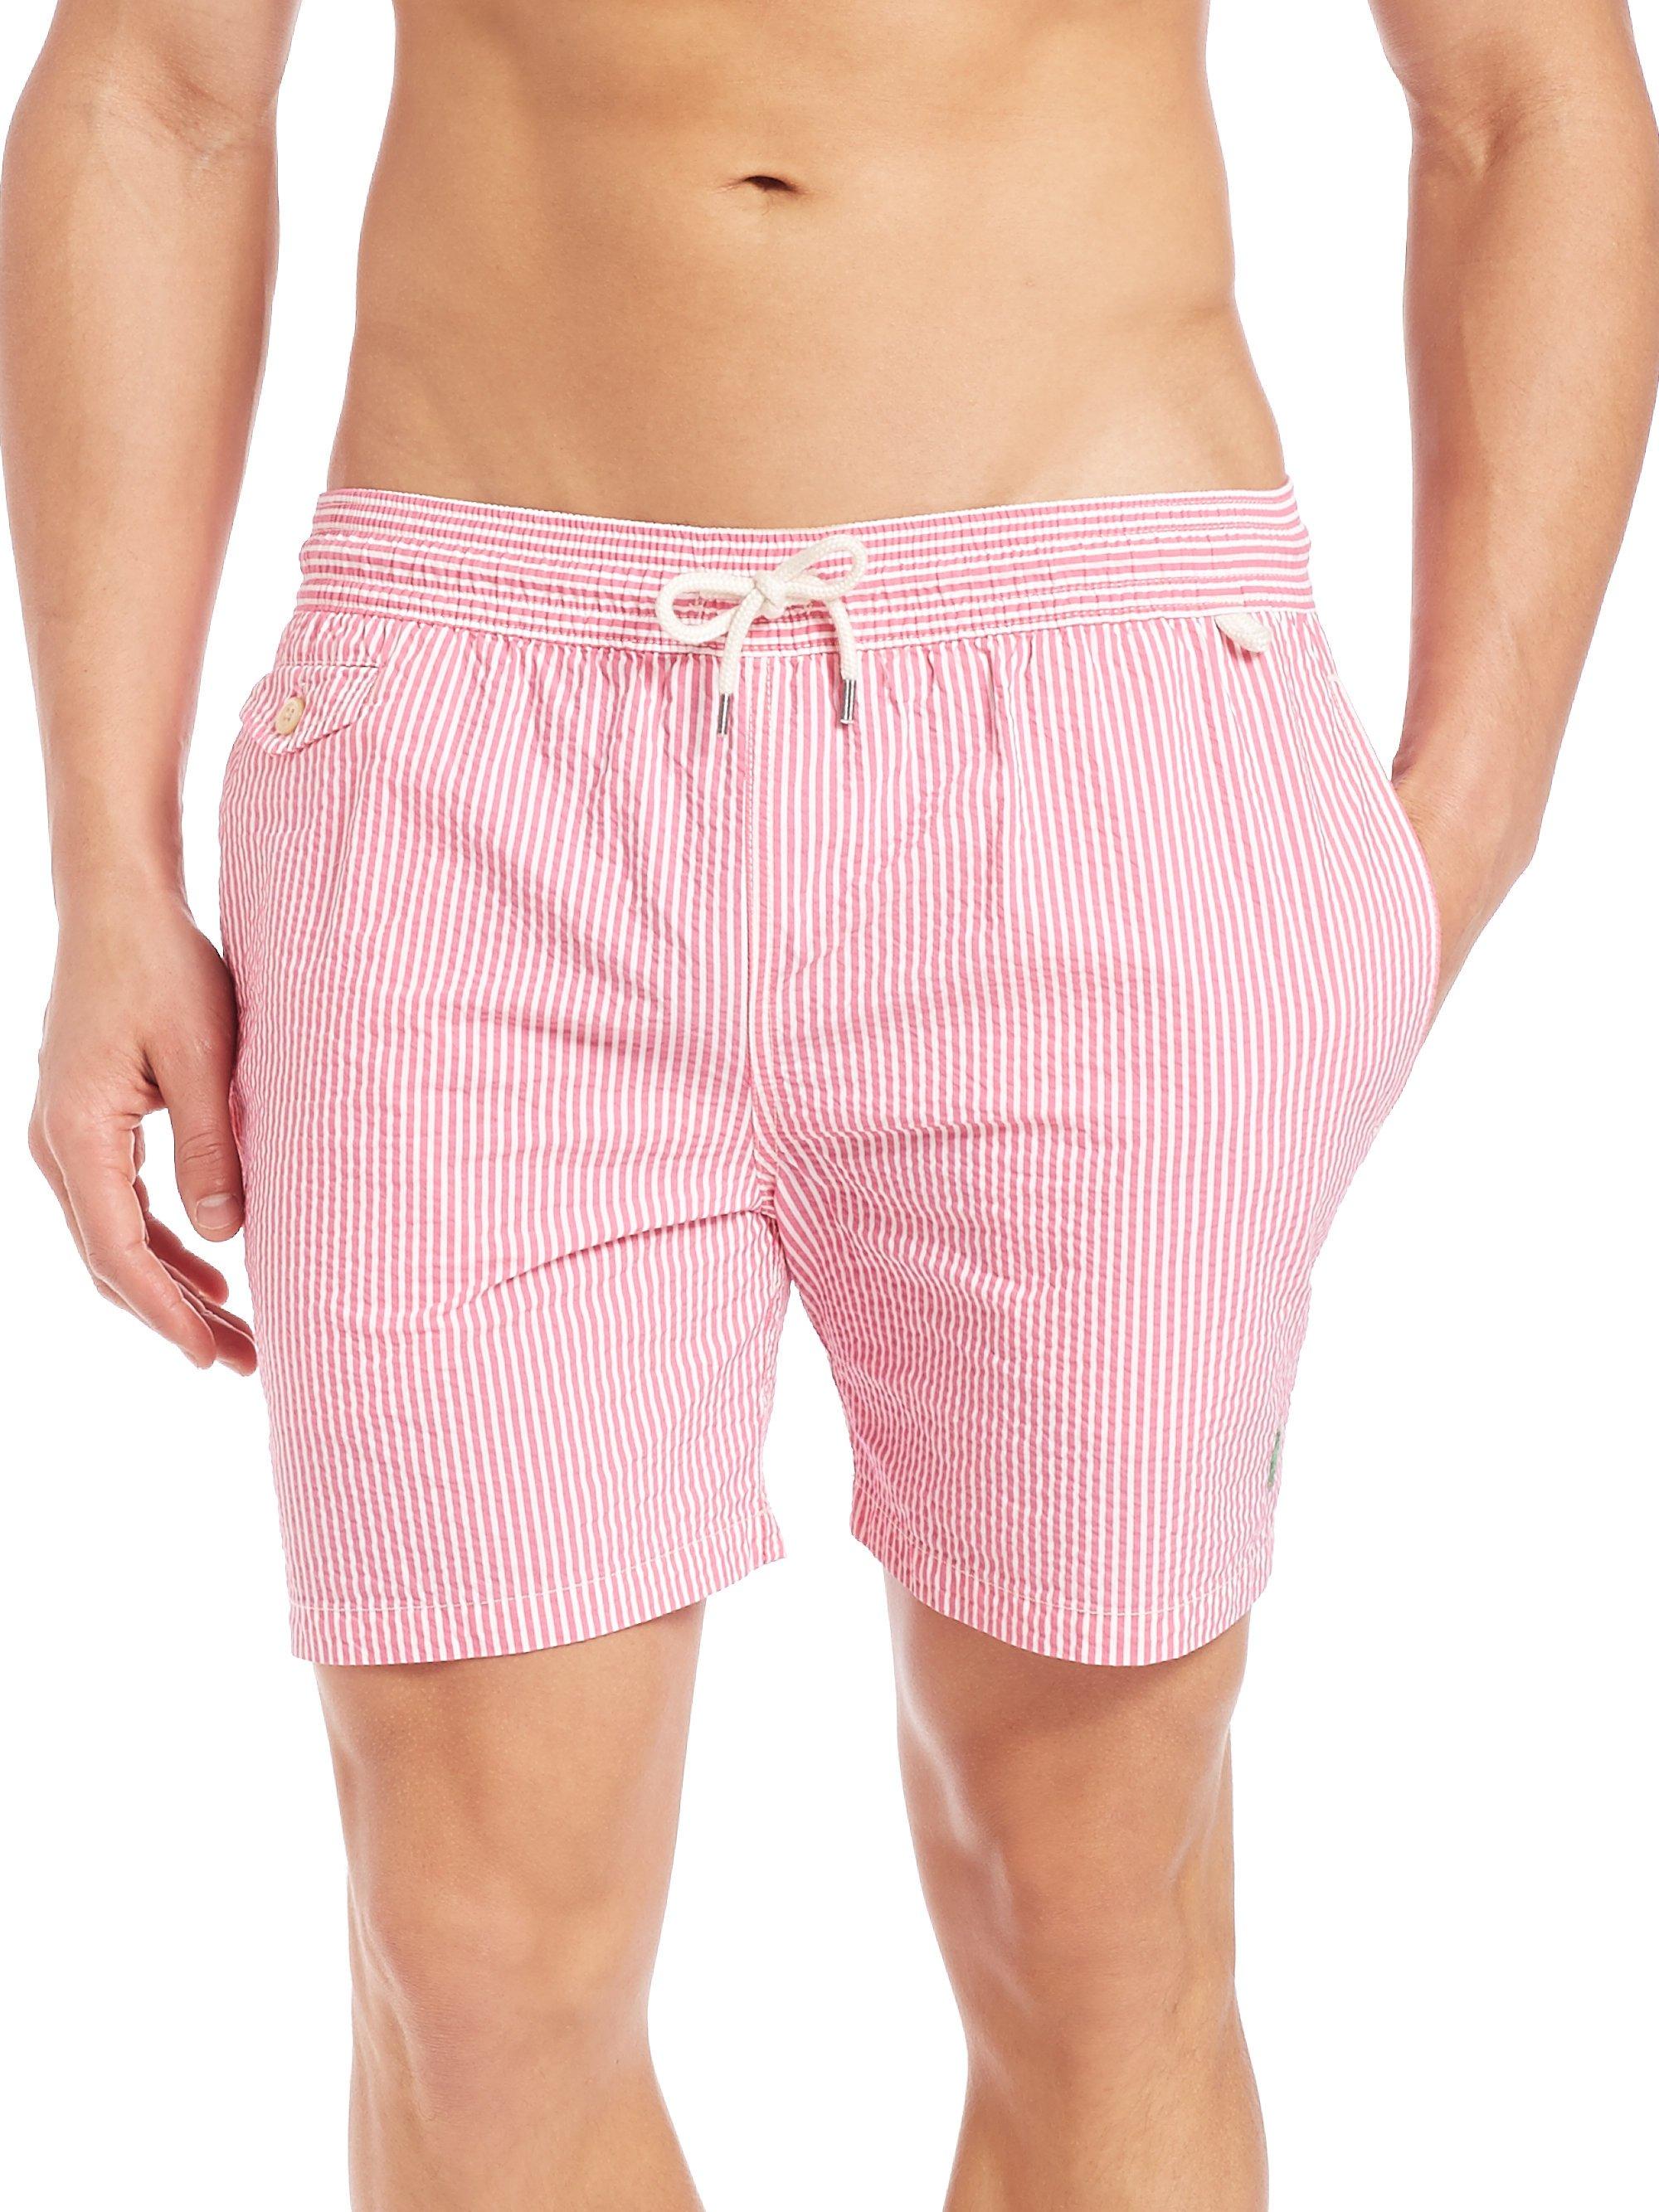 b0e6013548 Polo Ralph Lauren Seersucker Traveler Swim Shorts in Pink for Men - Lyst